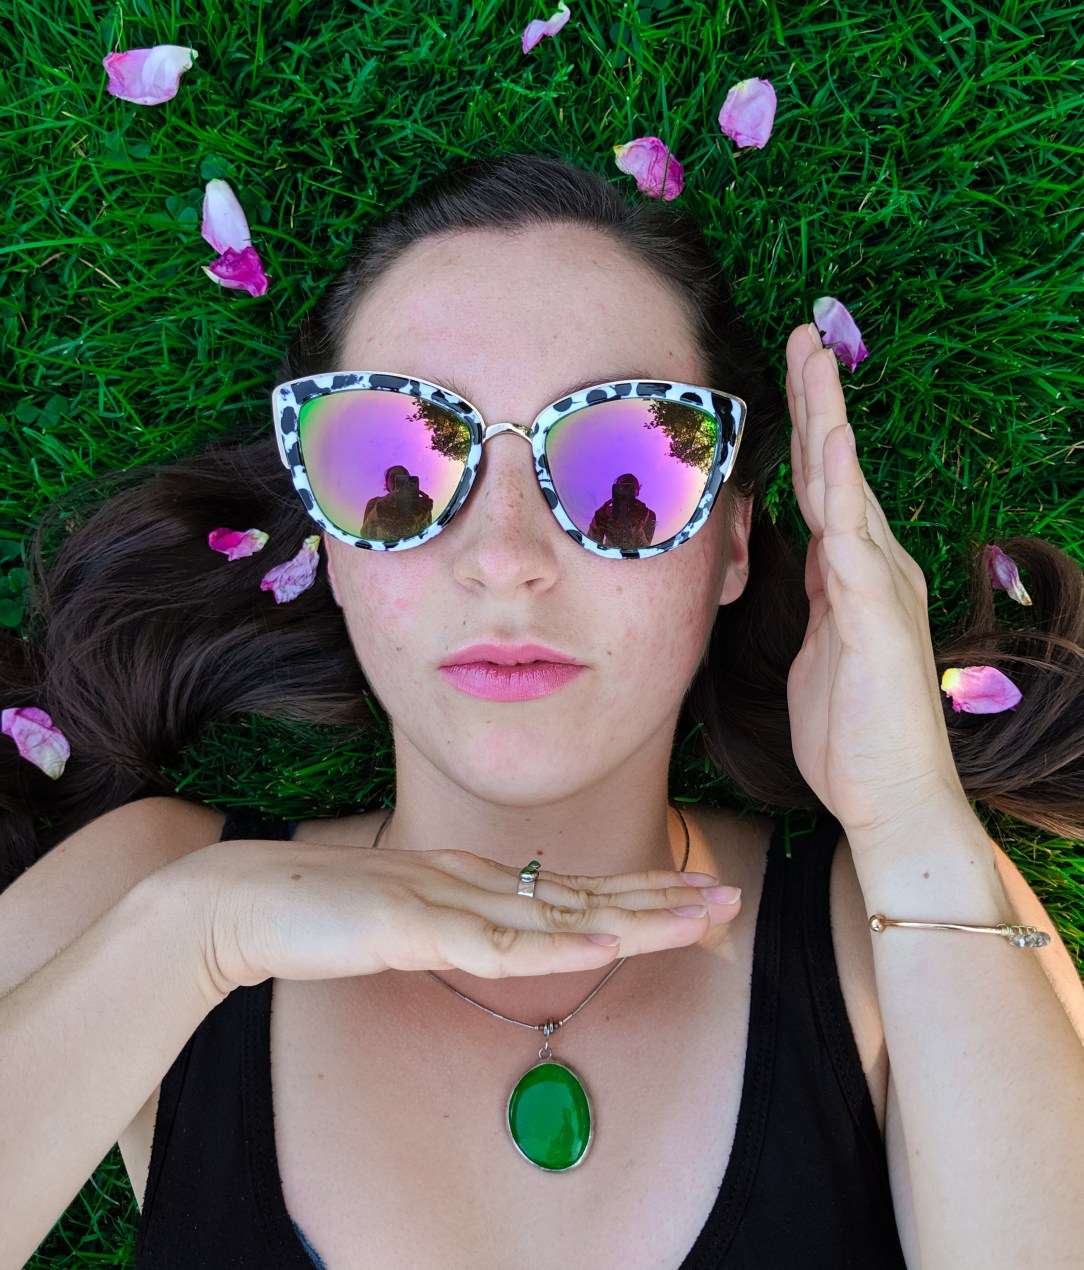 vogue, patterned sunglasses, mirrored sunglasses